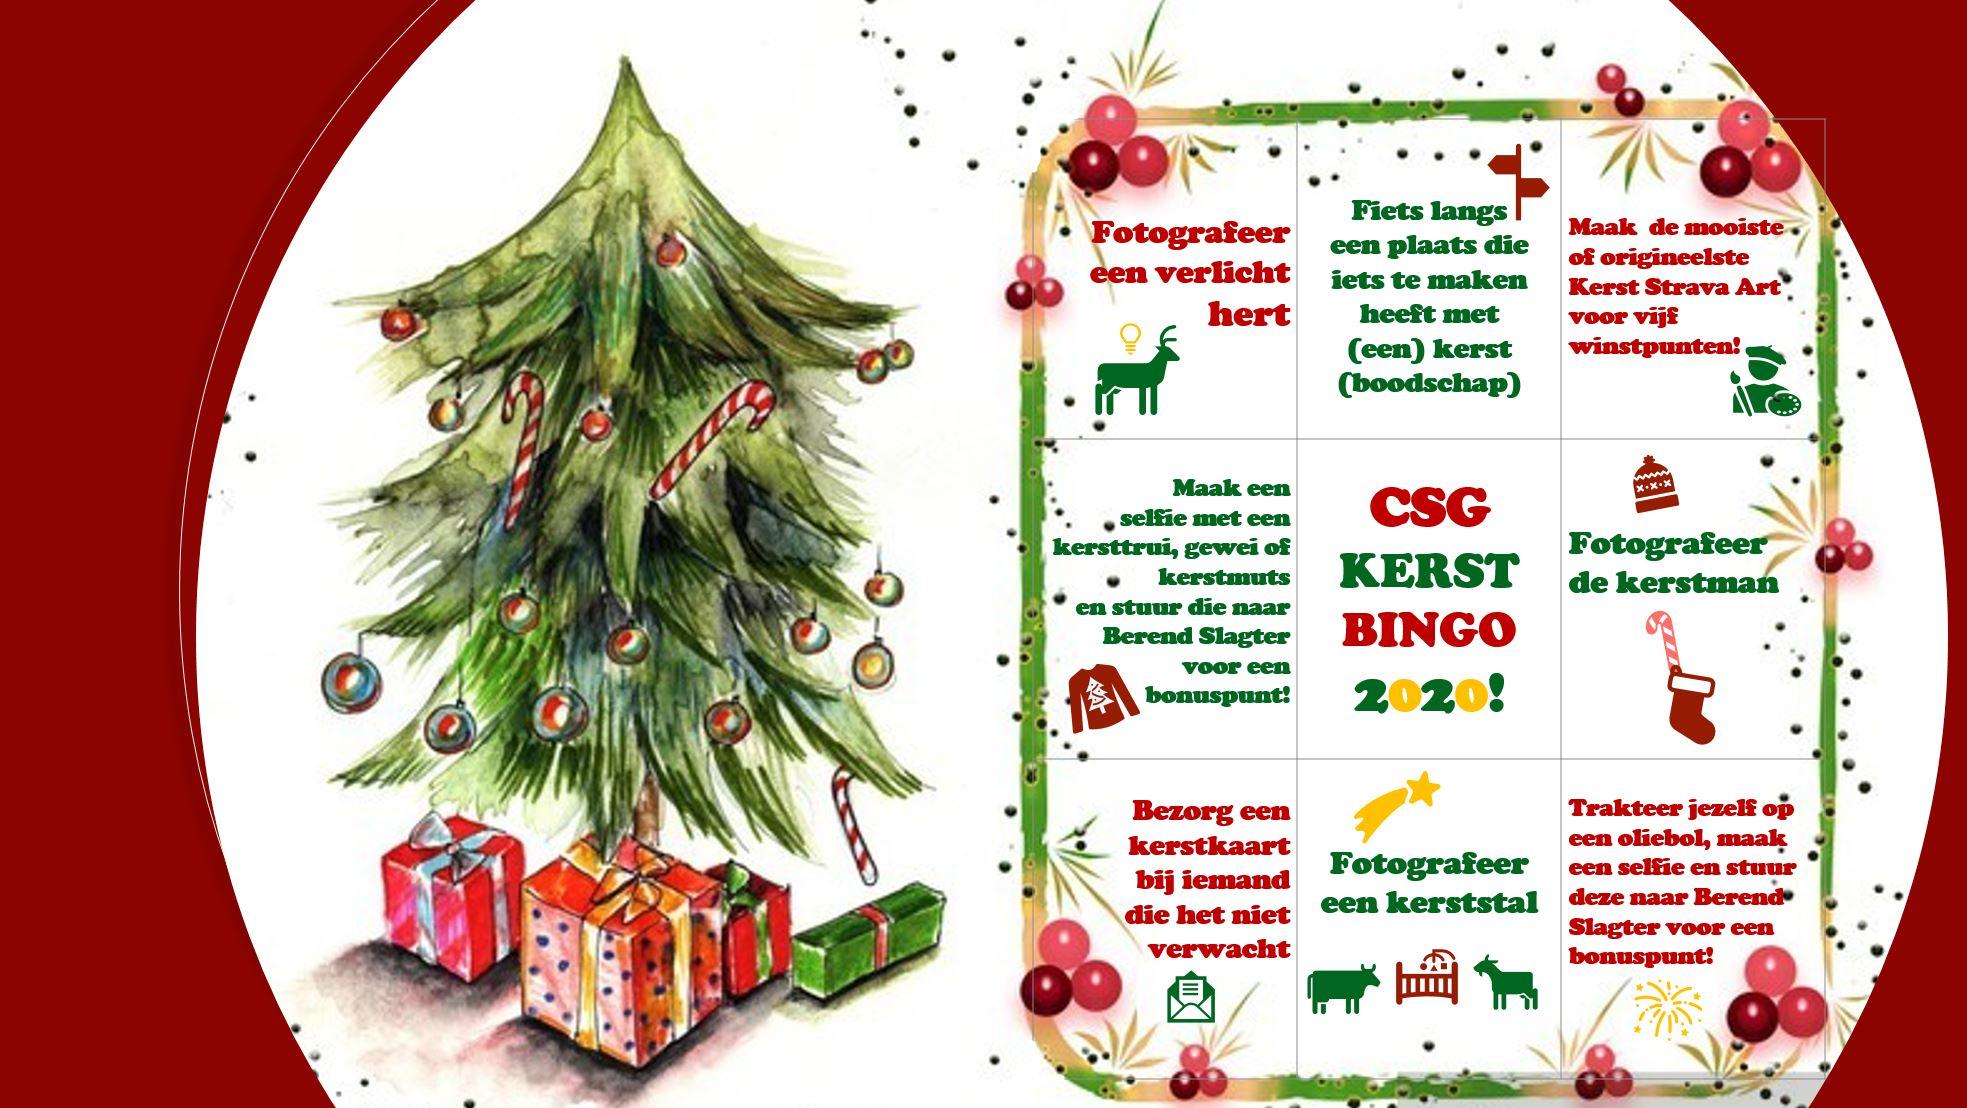 CSG kerstchallenge - le grande finale